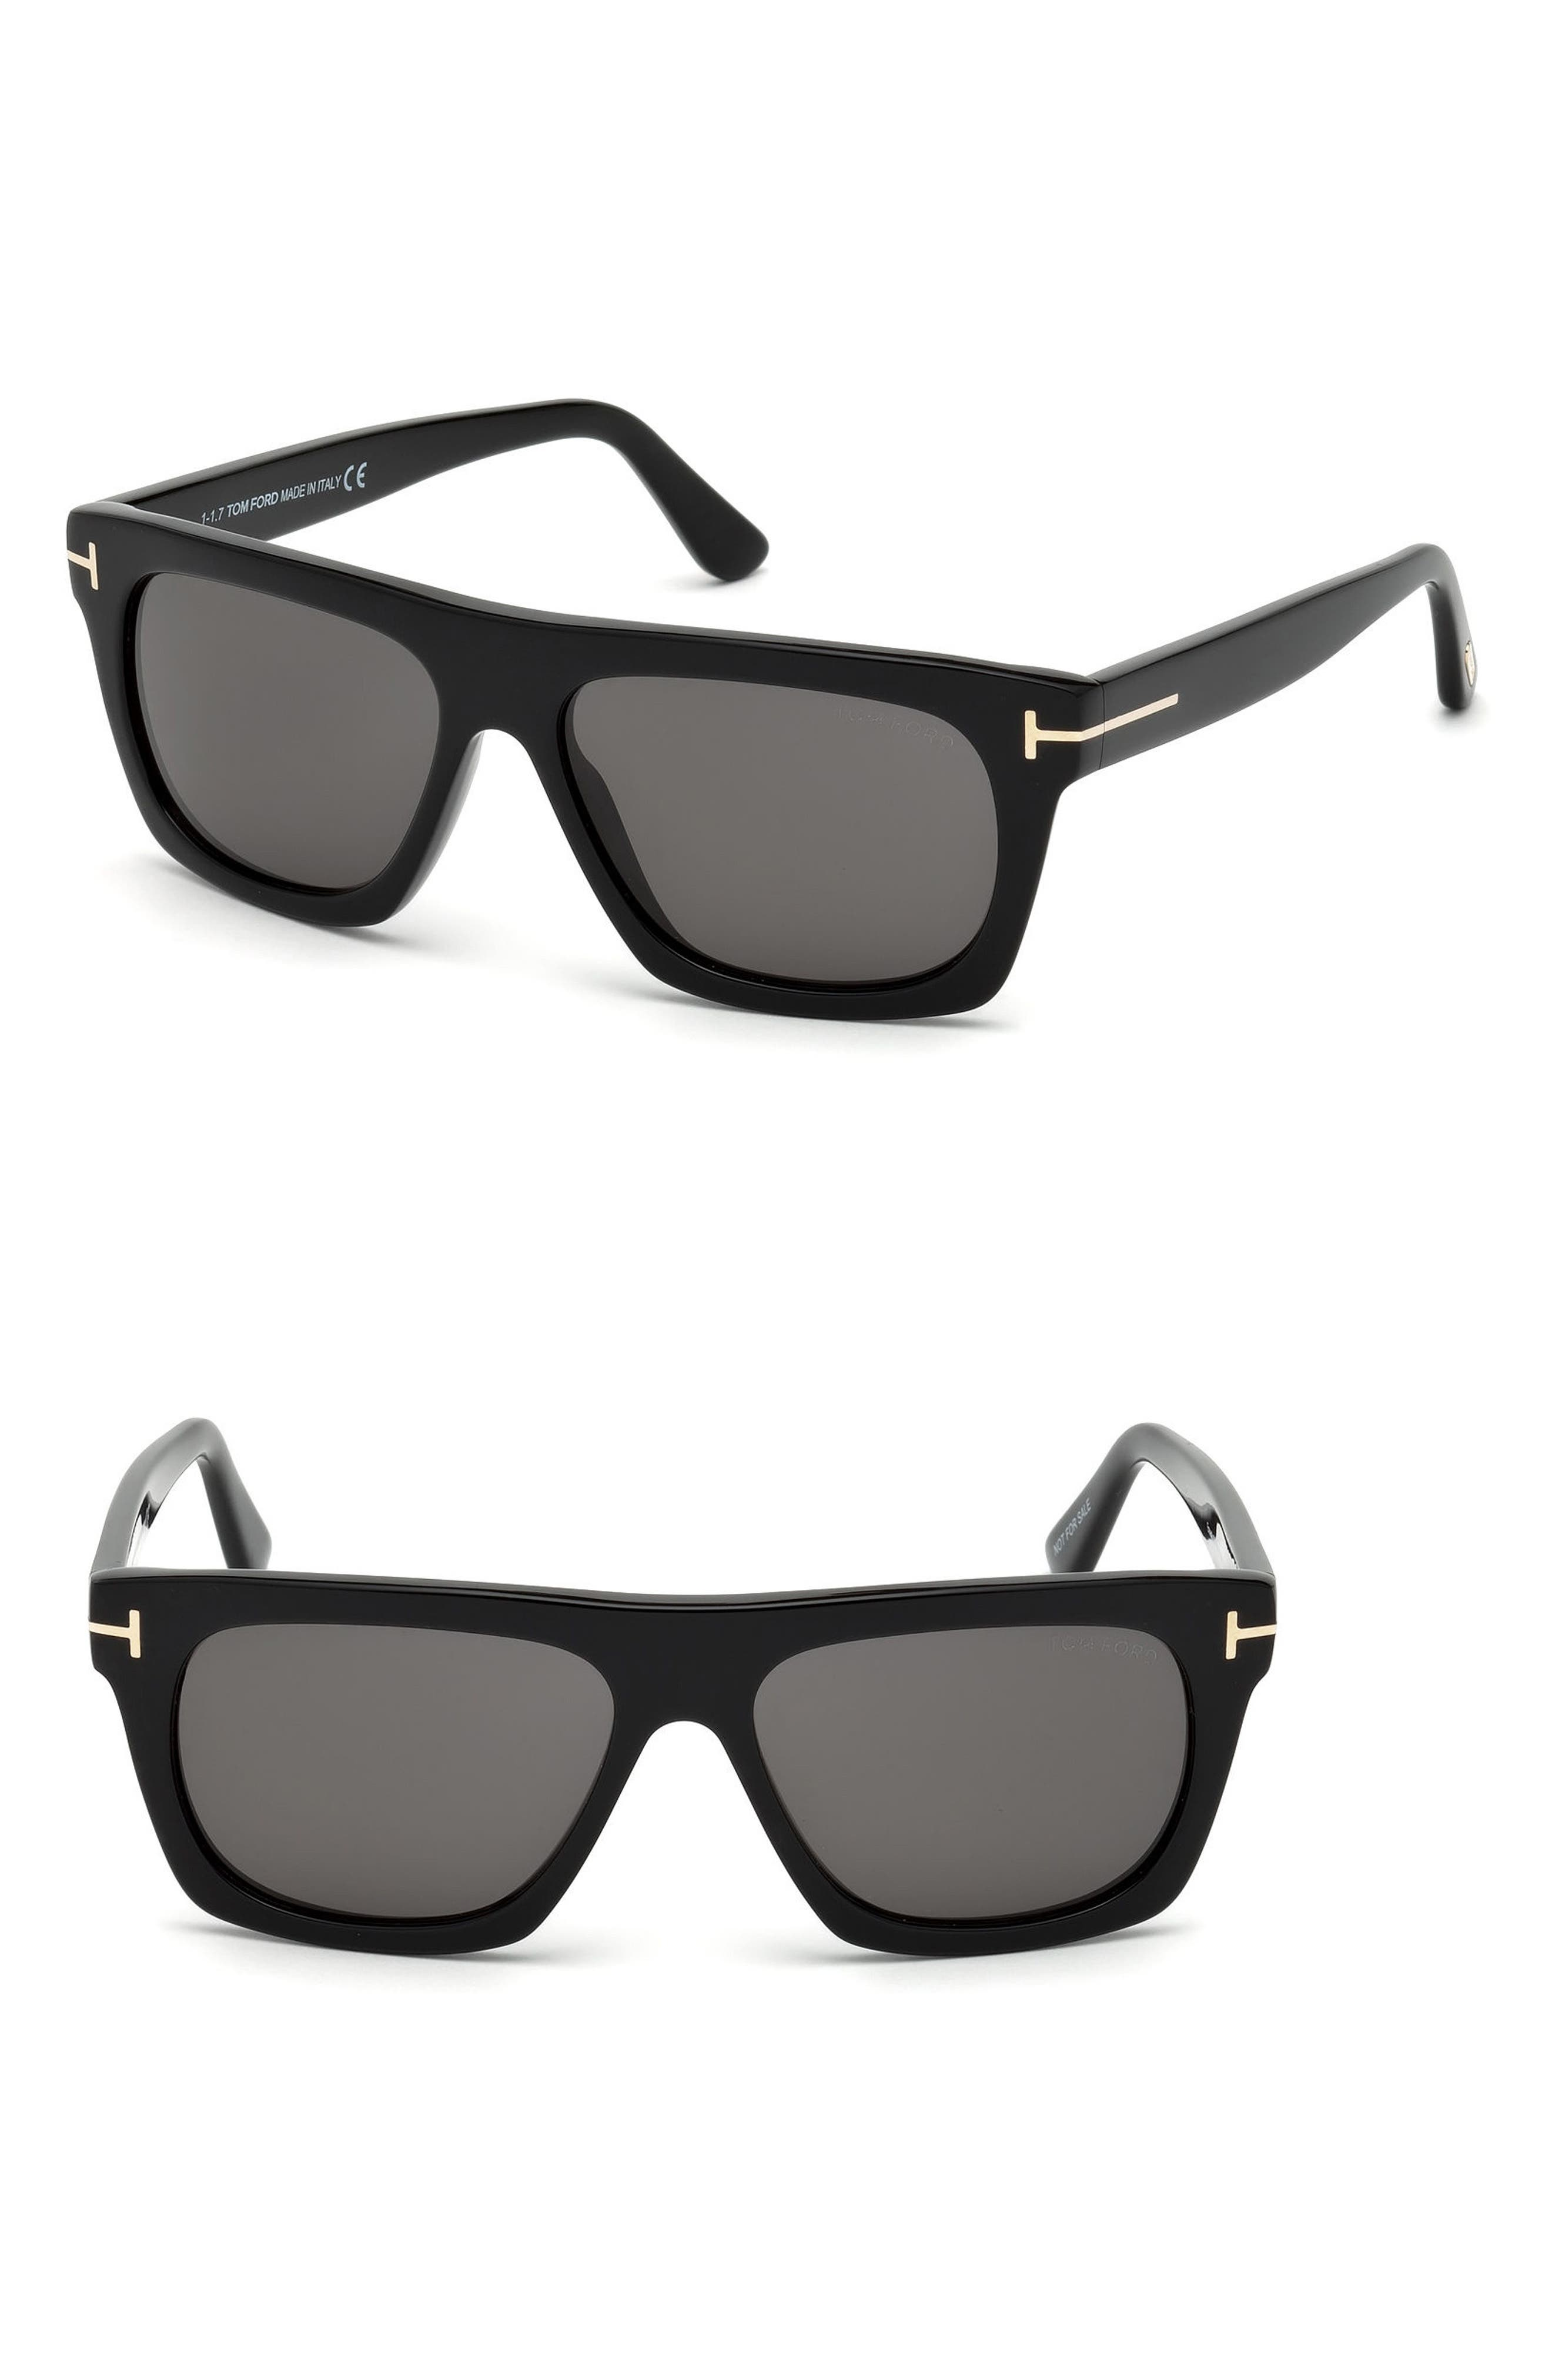 Ernesto 55mm Sunglasses,                             Main thumbnail 1, color,                             001